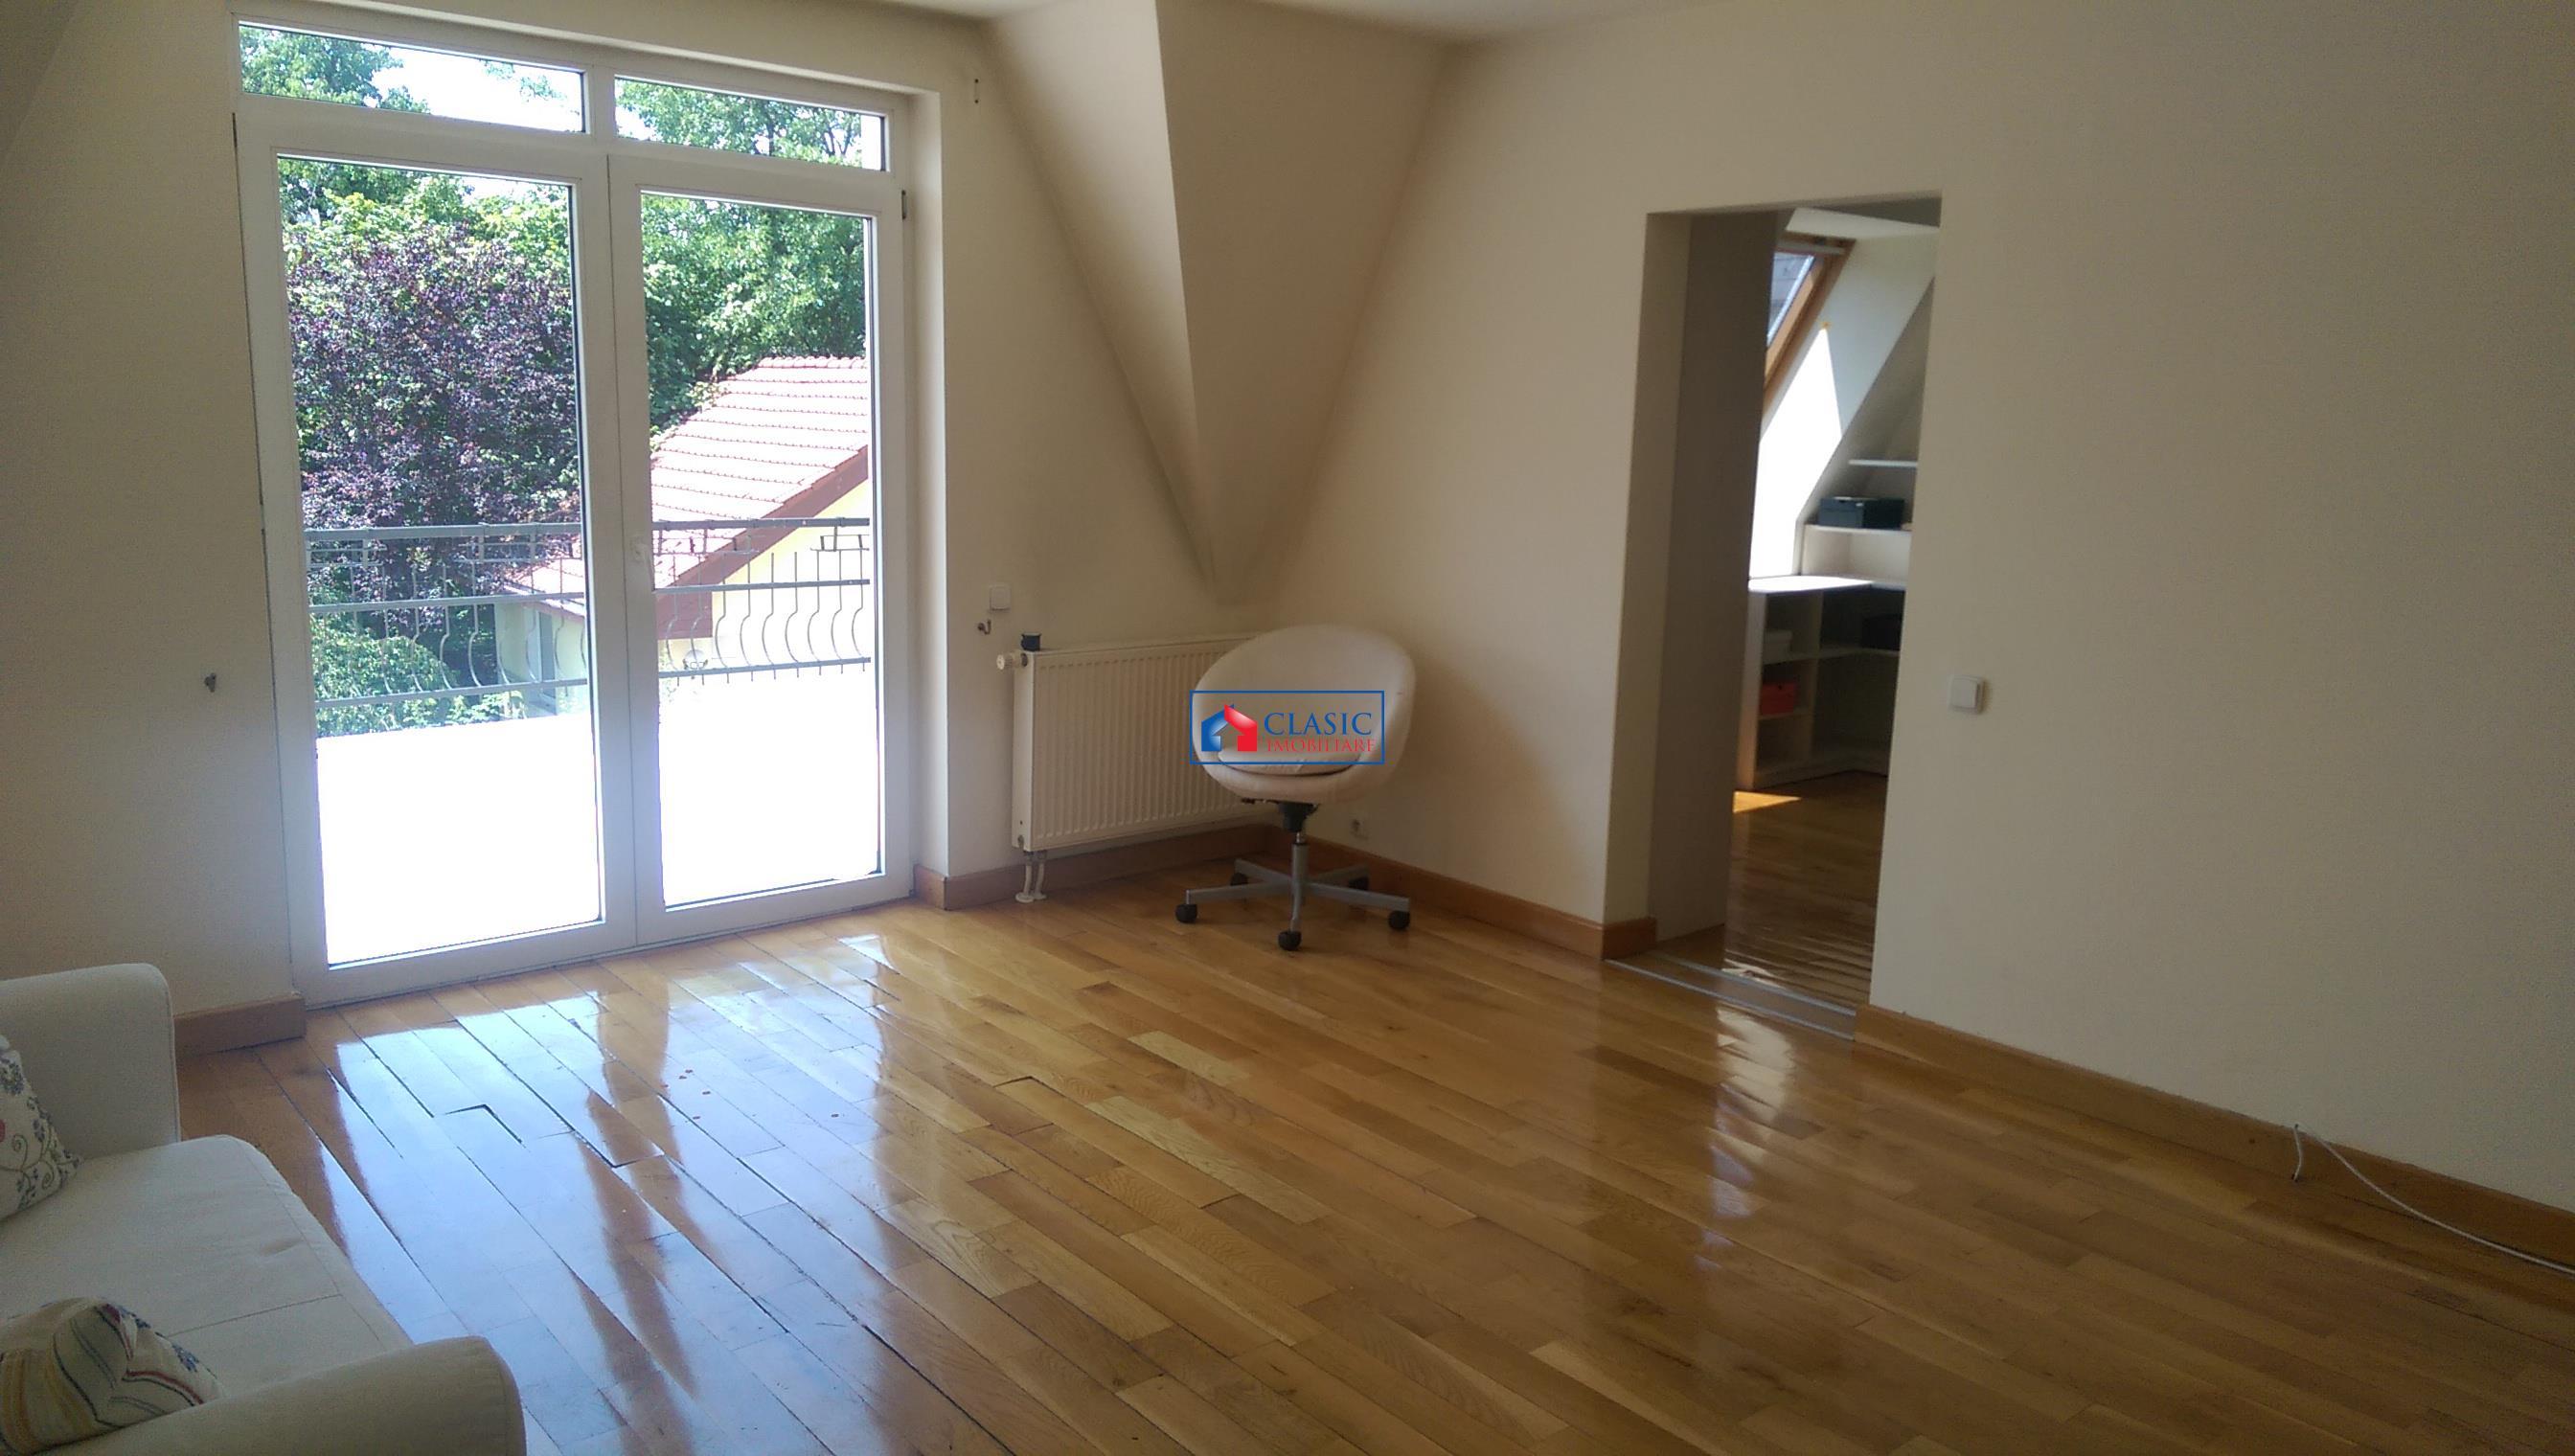 Inchiriere casa spatioasa zona Engels, A.Muresanu, Cluj Napoca